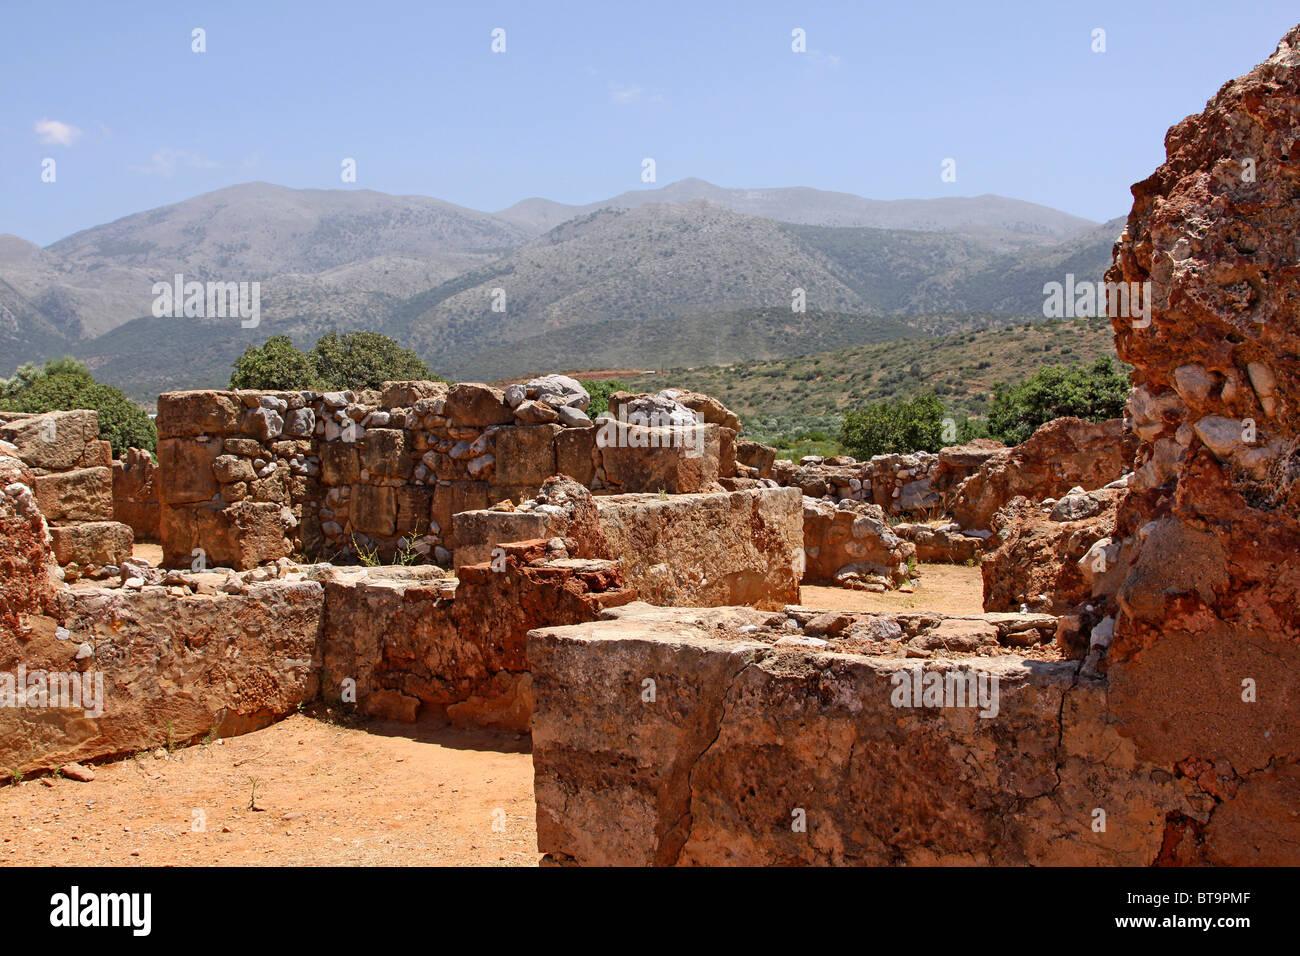 Malia Palace, archaeological excavation site, Minoan palace, Heraklion, Crete, Greece, Europe Stock Photo